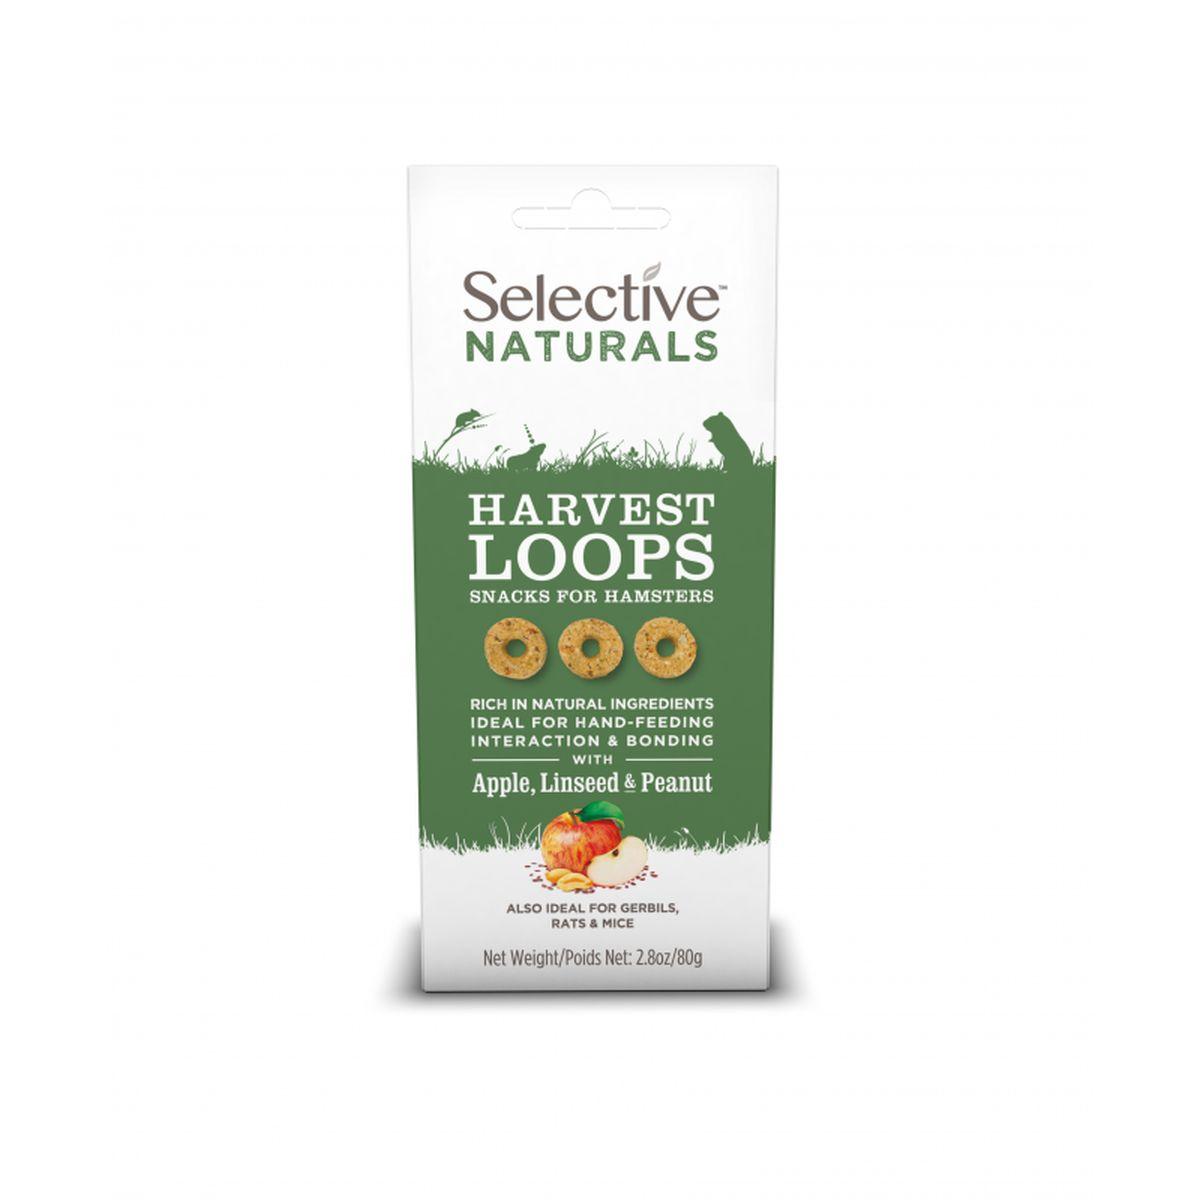 SUPREME SELECTIVE NATURALS HARVEST LOOPS